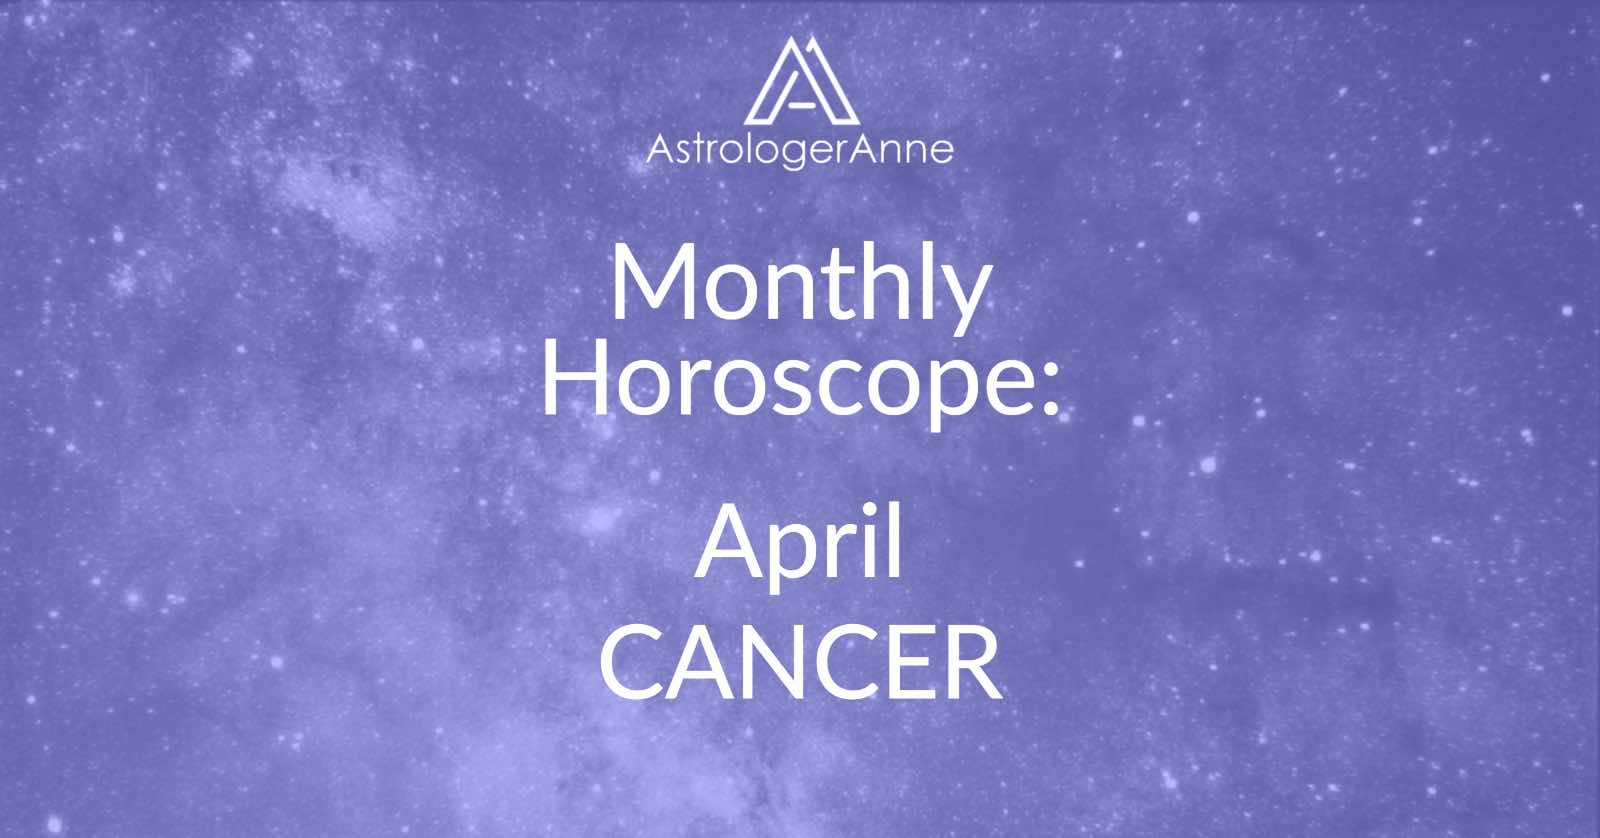 4292e7580 Monthly horoscope for Cancer zodiac sign, April 2019